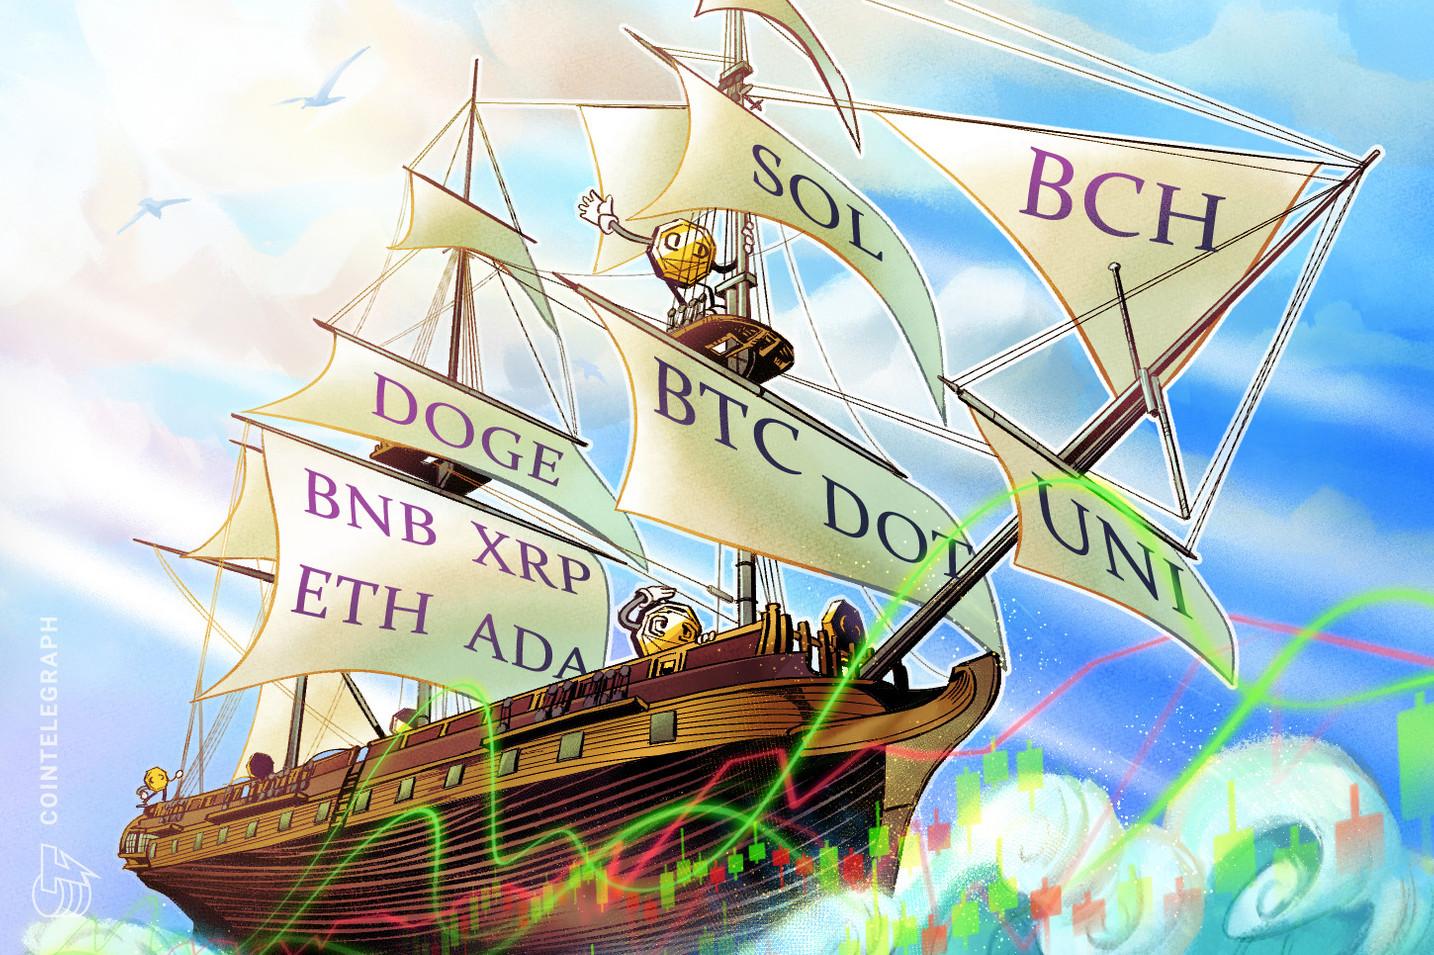 Análisis de precios del 25 de agosto: BTC, ETH, ADA, BNB, XRP, DOGE, DOT, SOL, UNI, BCH